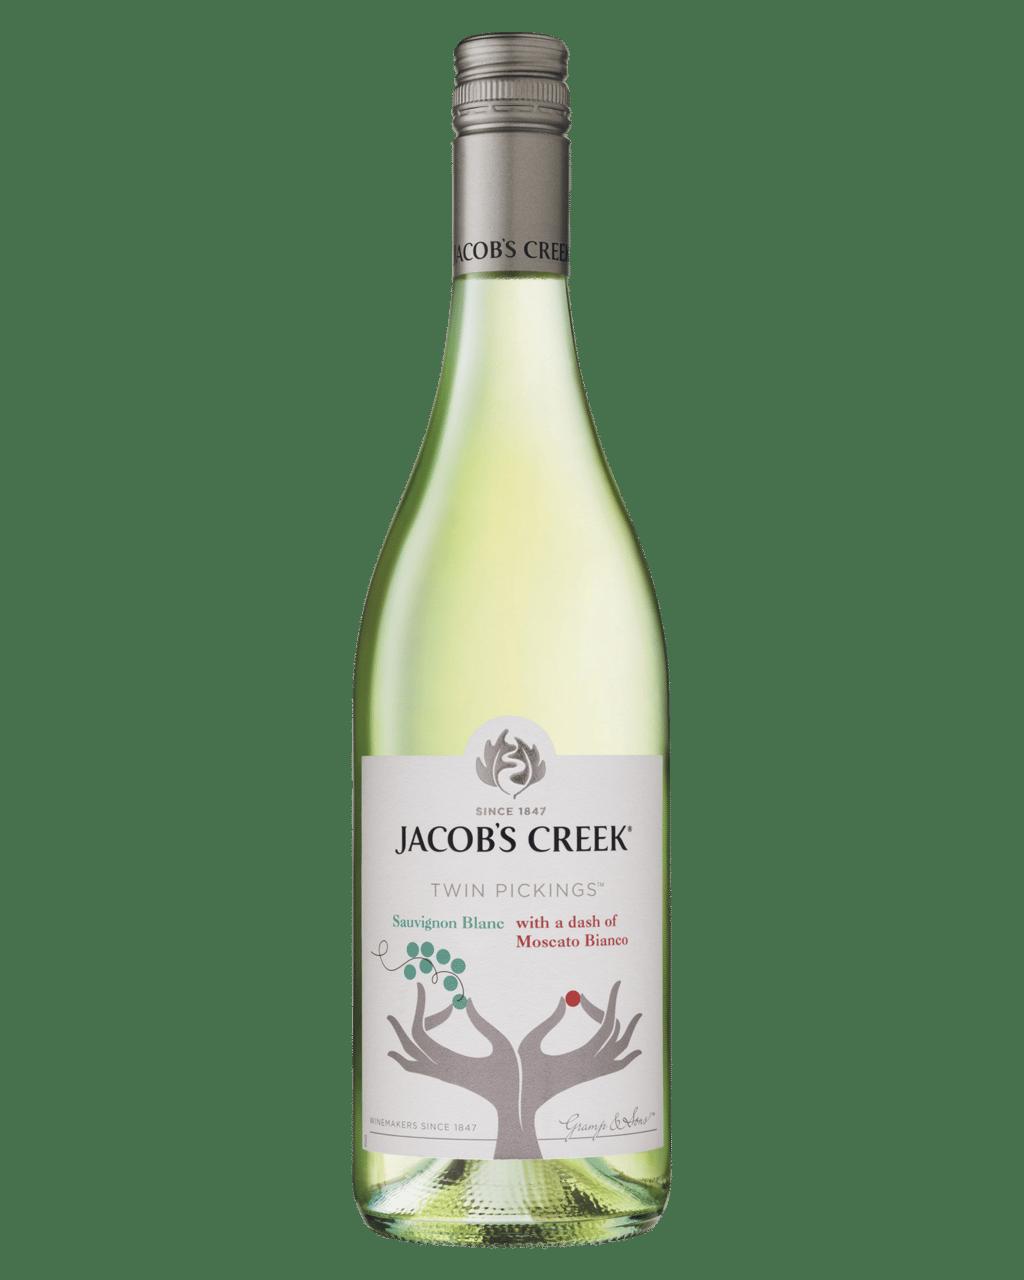 Buy Jacob's Creek Twin Pickings Sauvignon Blanc Moscato